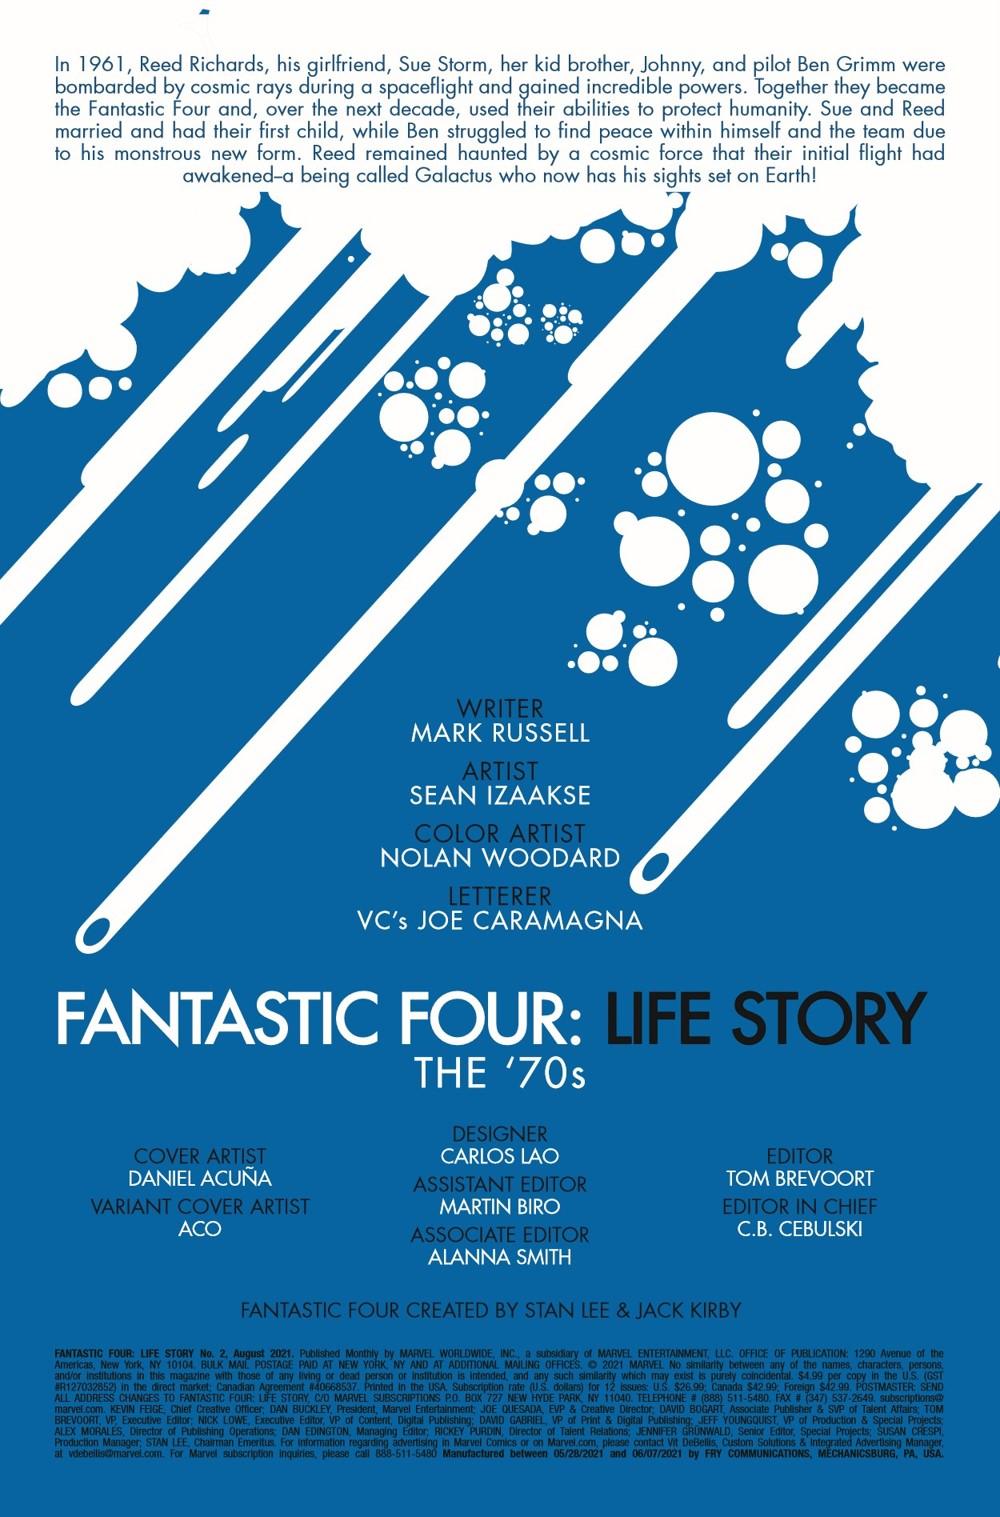 FFLIFESTORY2019002_Preview-2 ComicList Previews: FANTASTIC FOUR LIFE STORY #2 (OF 6)